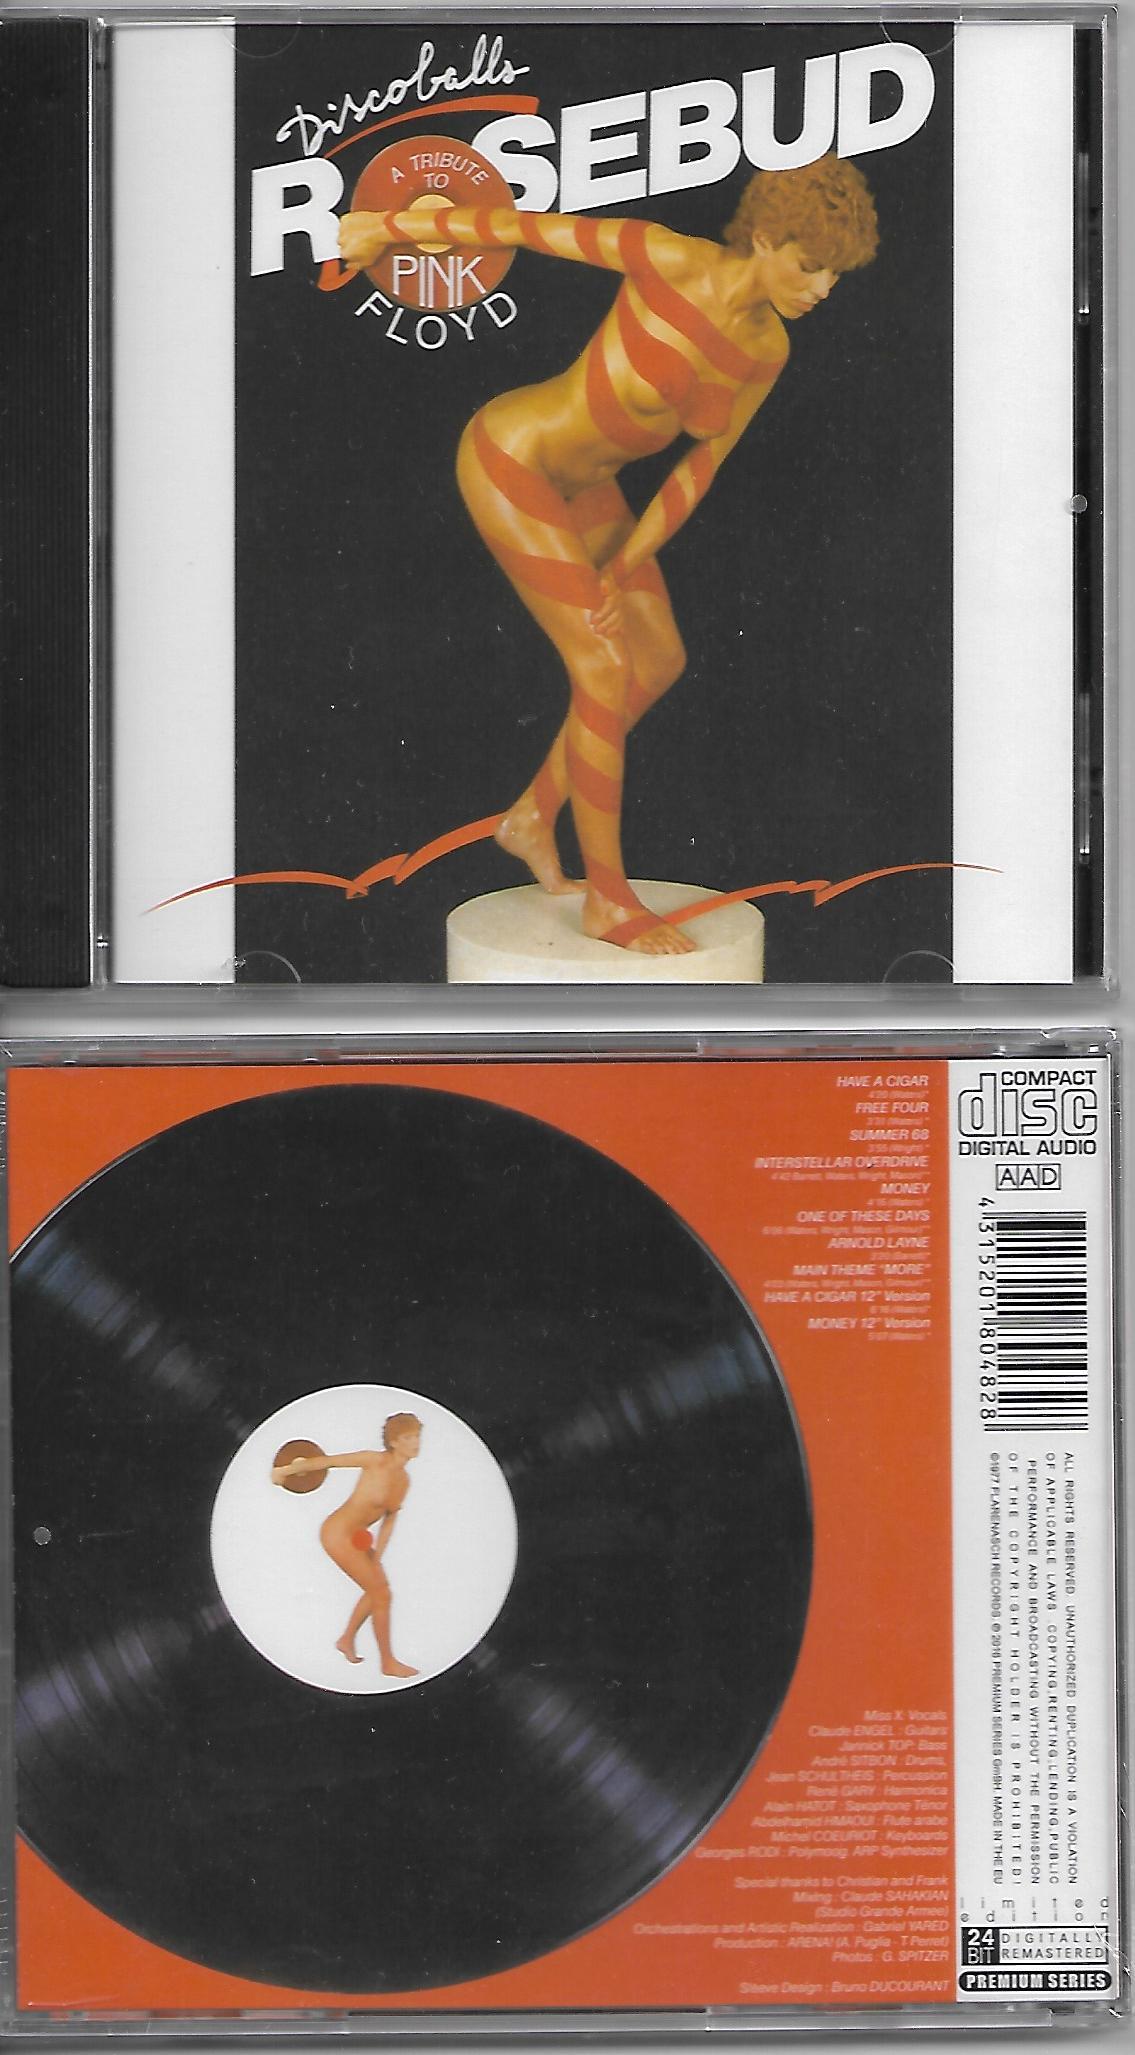 PINK FLOYD - P.U.L.S.E  - Pulse - CD x 2